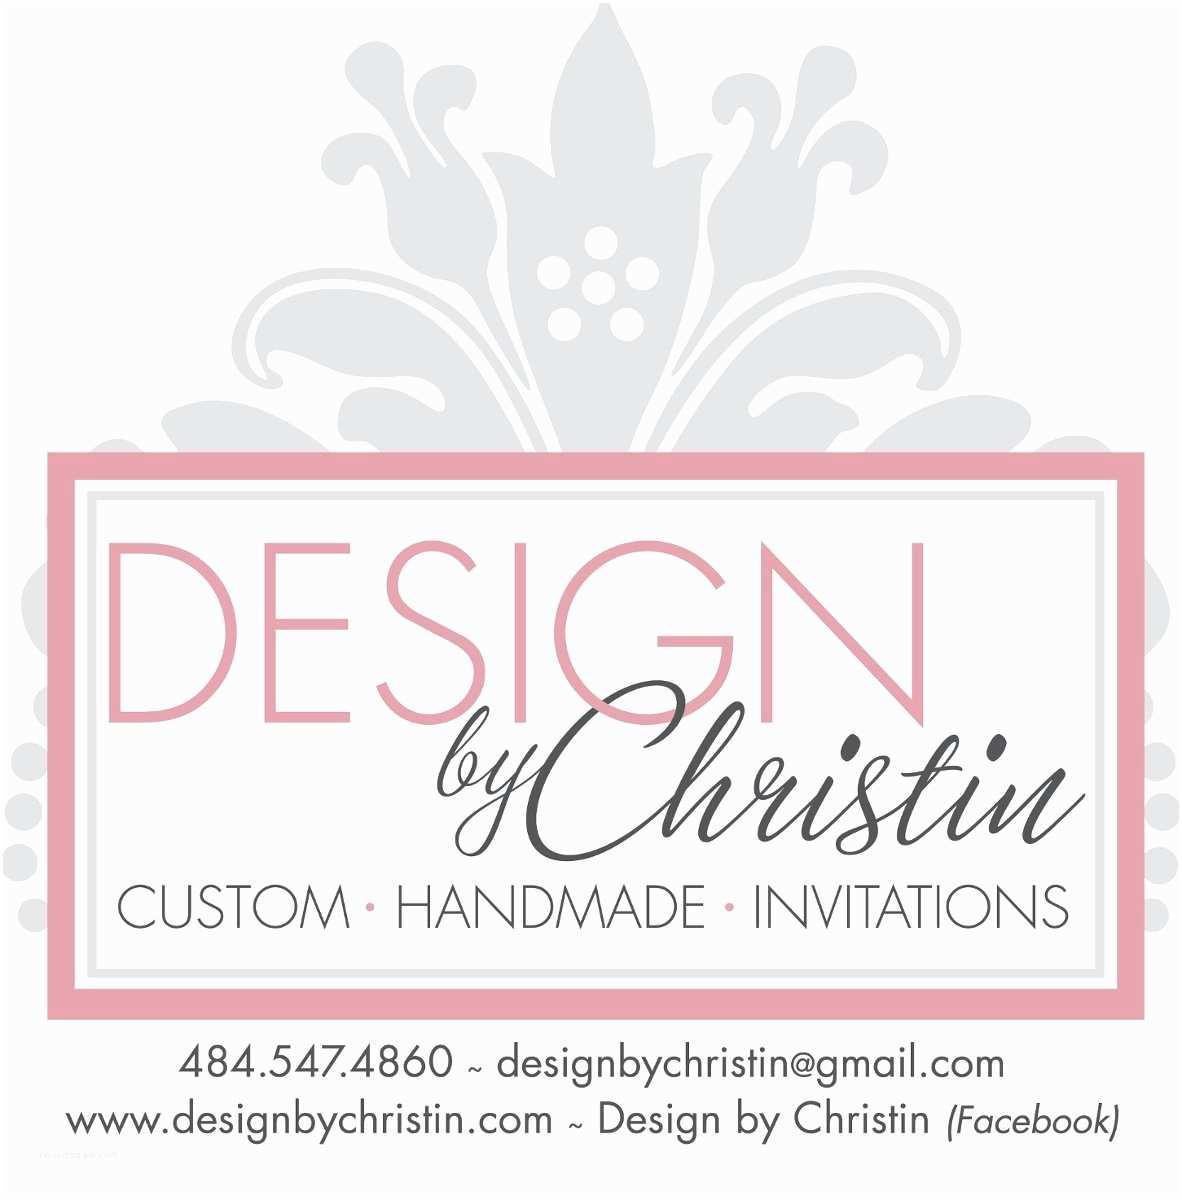 Wedding Invitations Boston Designbychristin Invitations Boston Ma Weddingwire